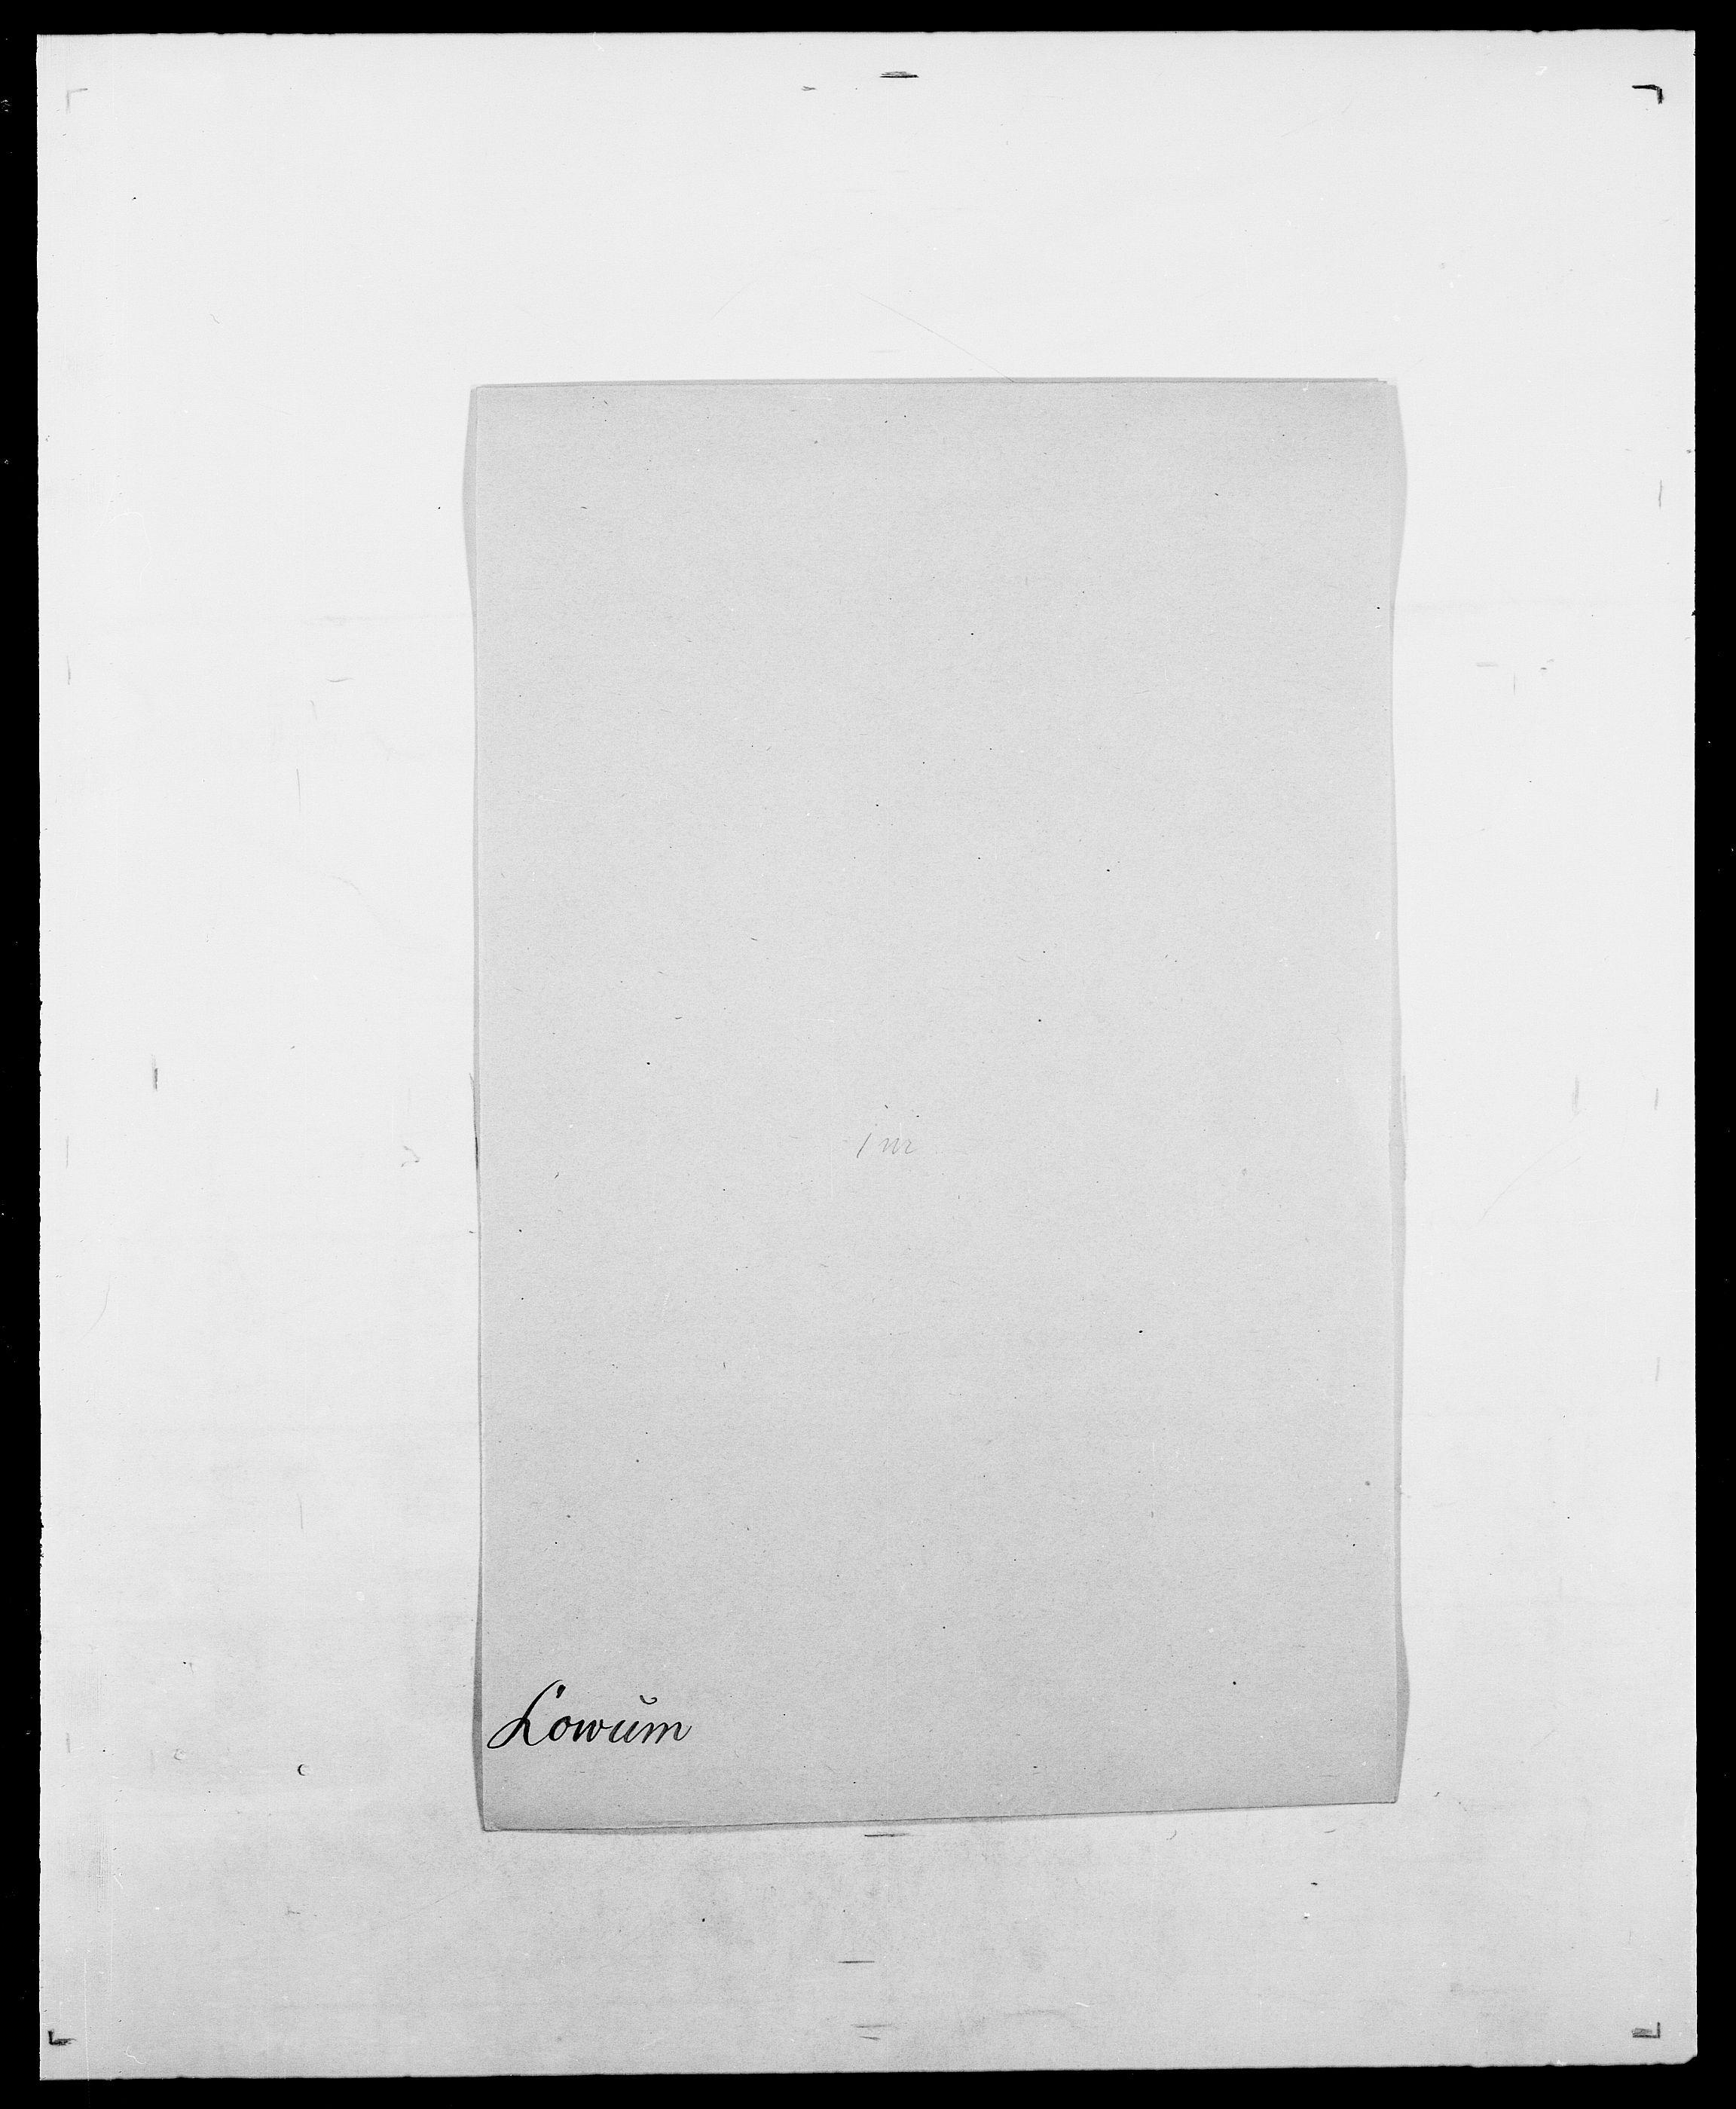 SAO, Delgobe, Charles Antoine - samling, D/Da/L0024: Lobech - Lærum, s. 353